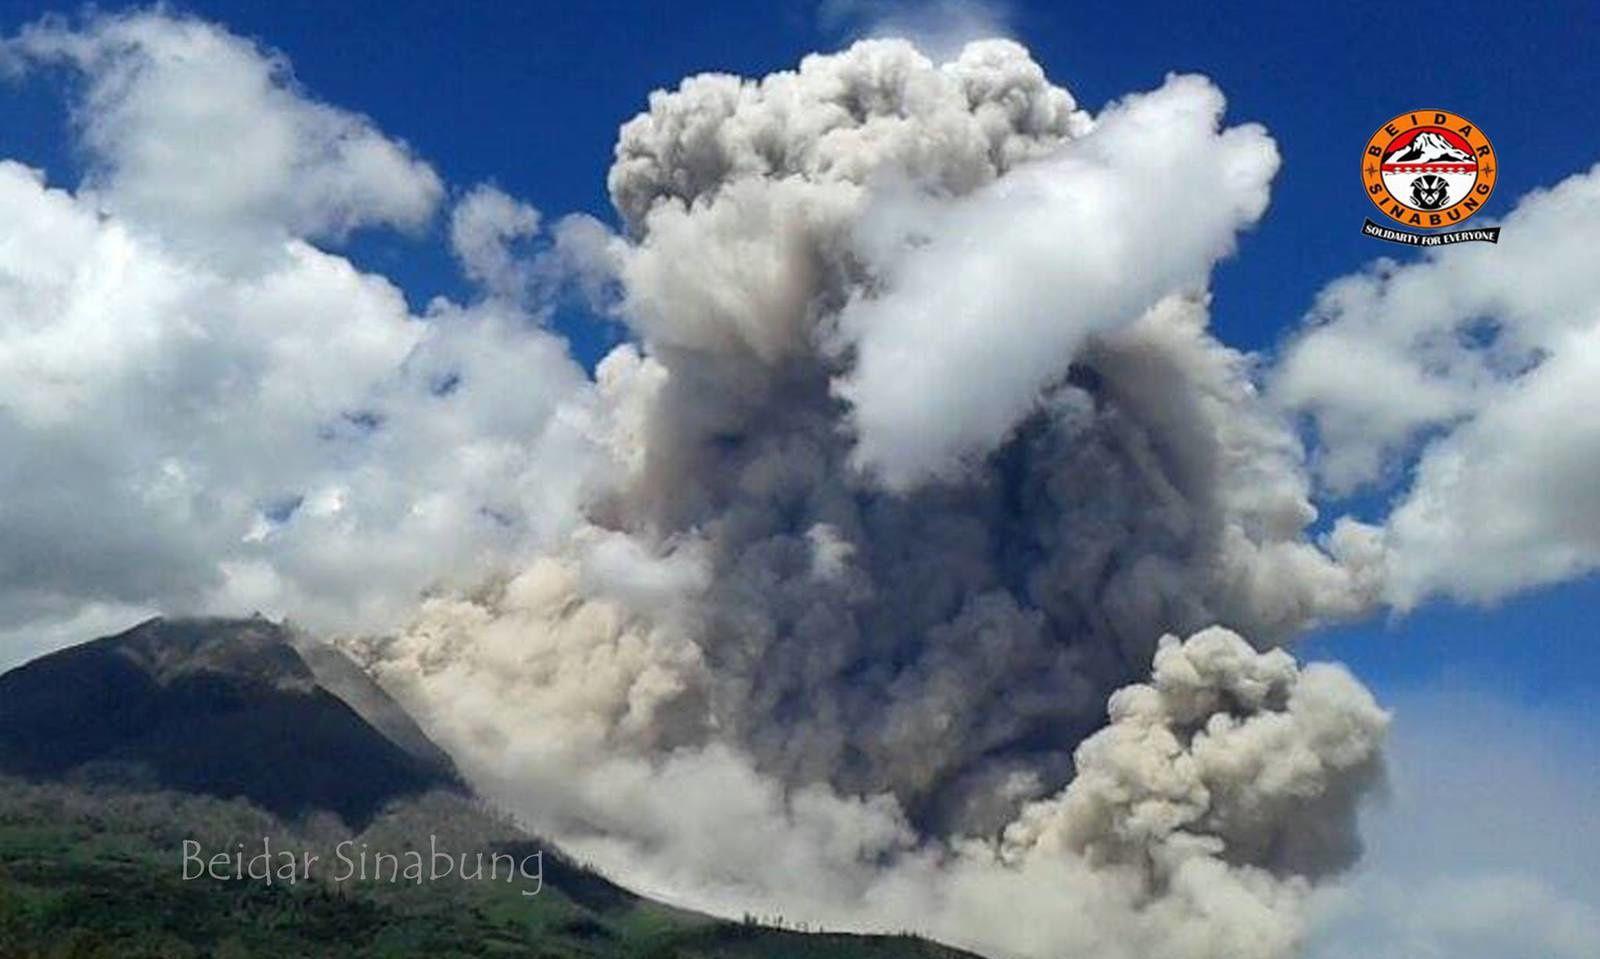 Sinabung - panache co-pyroclastique du 12.01.2015 / 14h05-14h45 - photo Bidar Sinabung